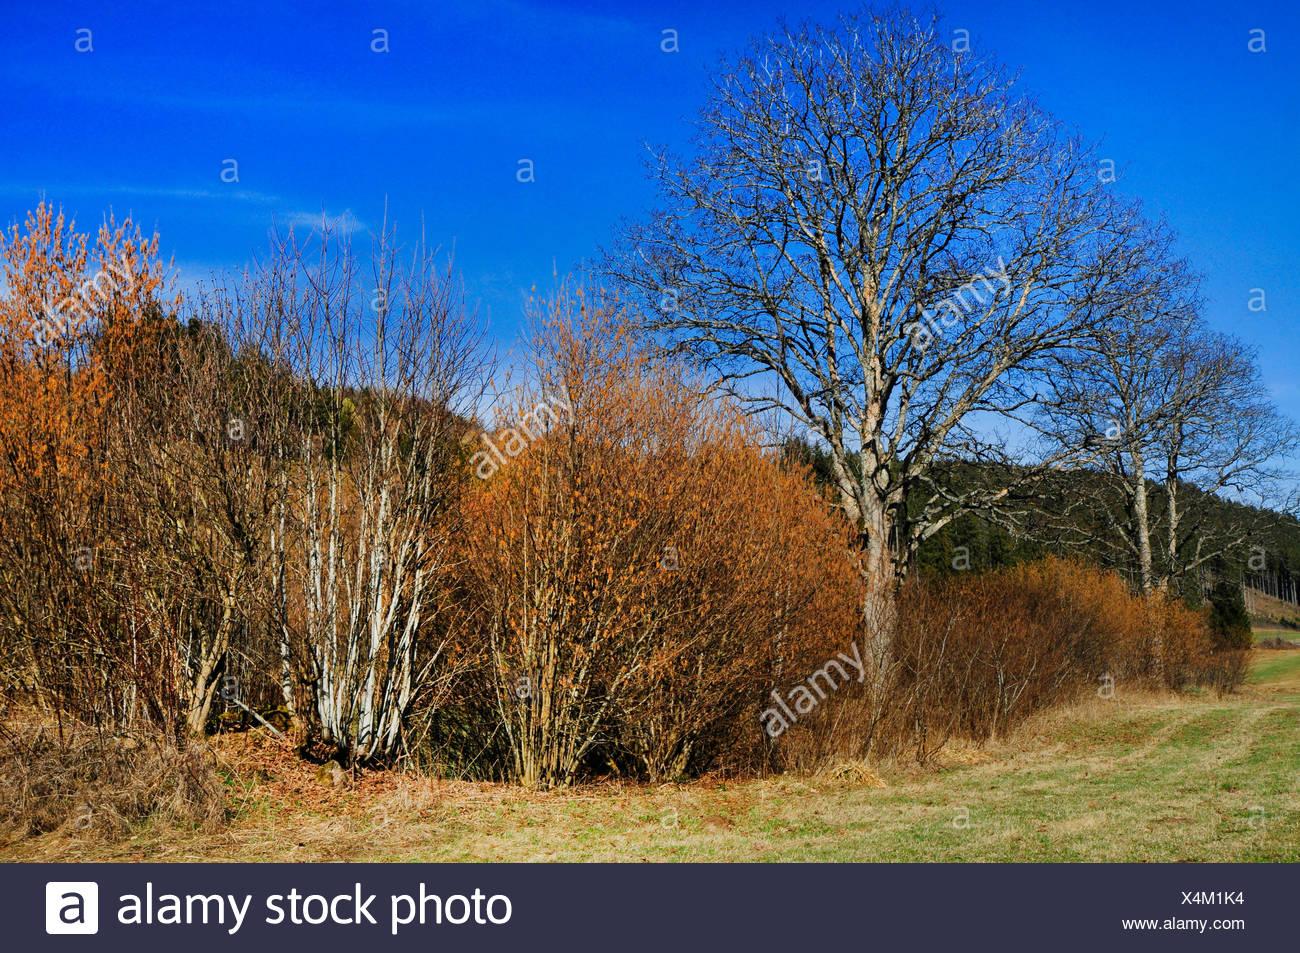 hedge at the Black Forest, Germany, Black Forest, Breisgau-Hochschwarzwald, Lenzkirch - Stock Image